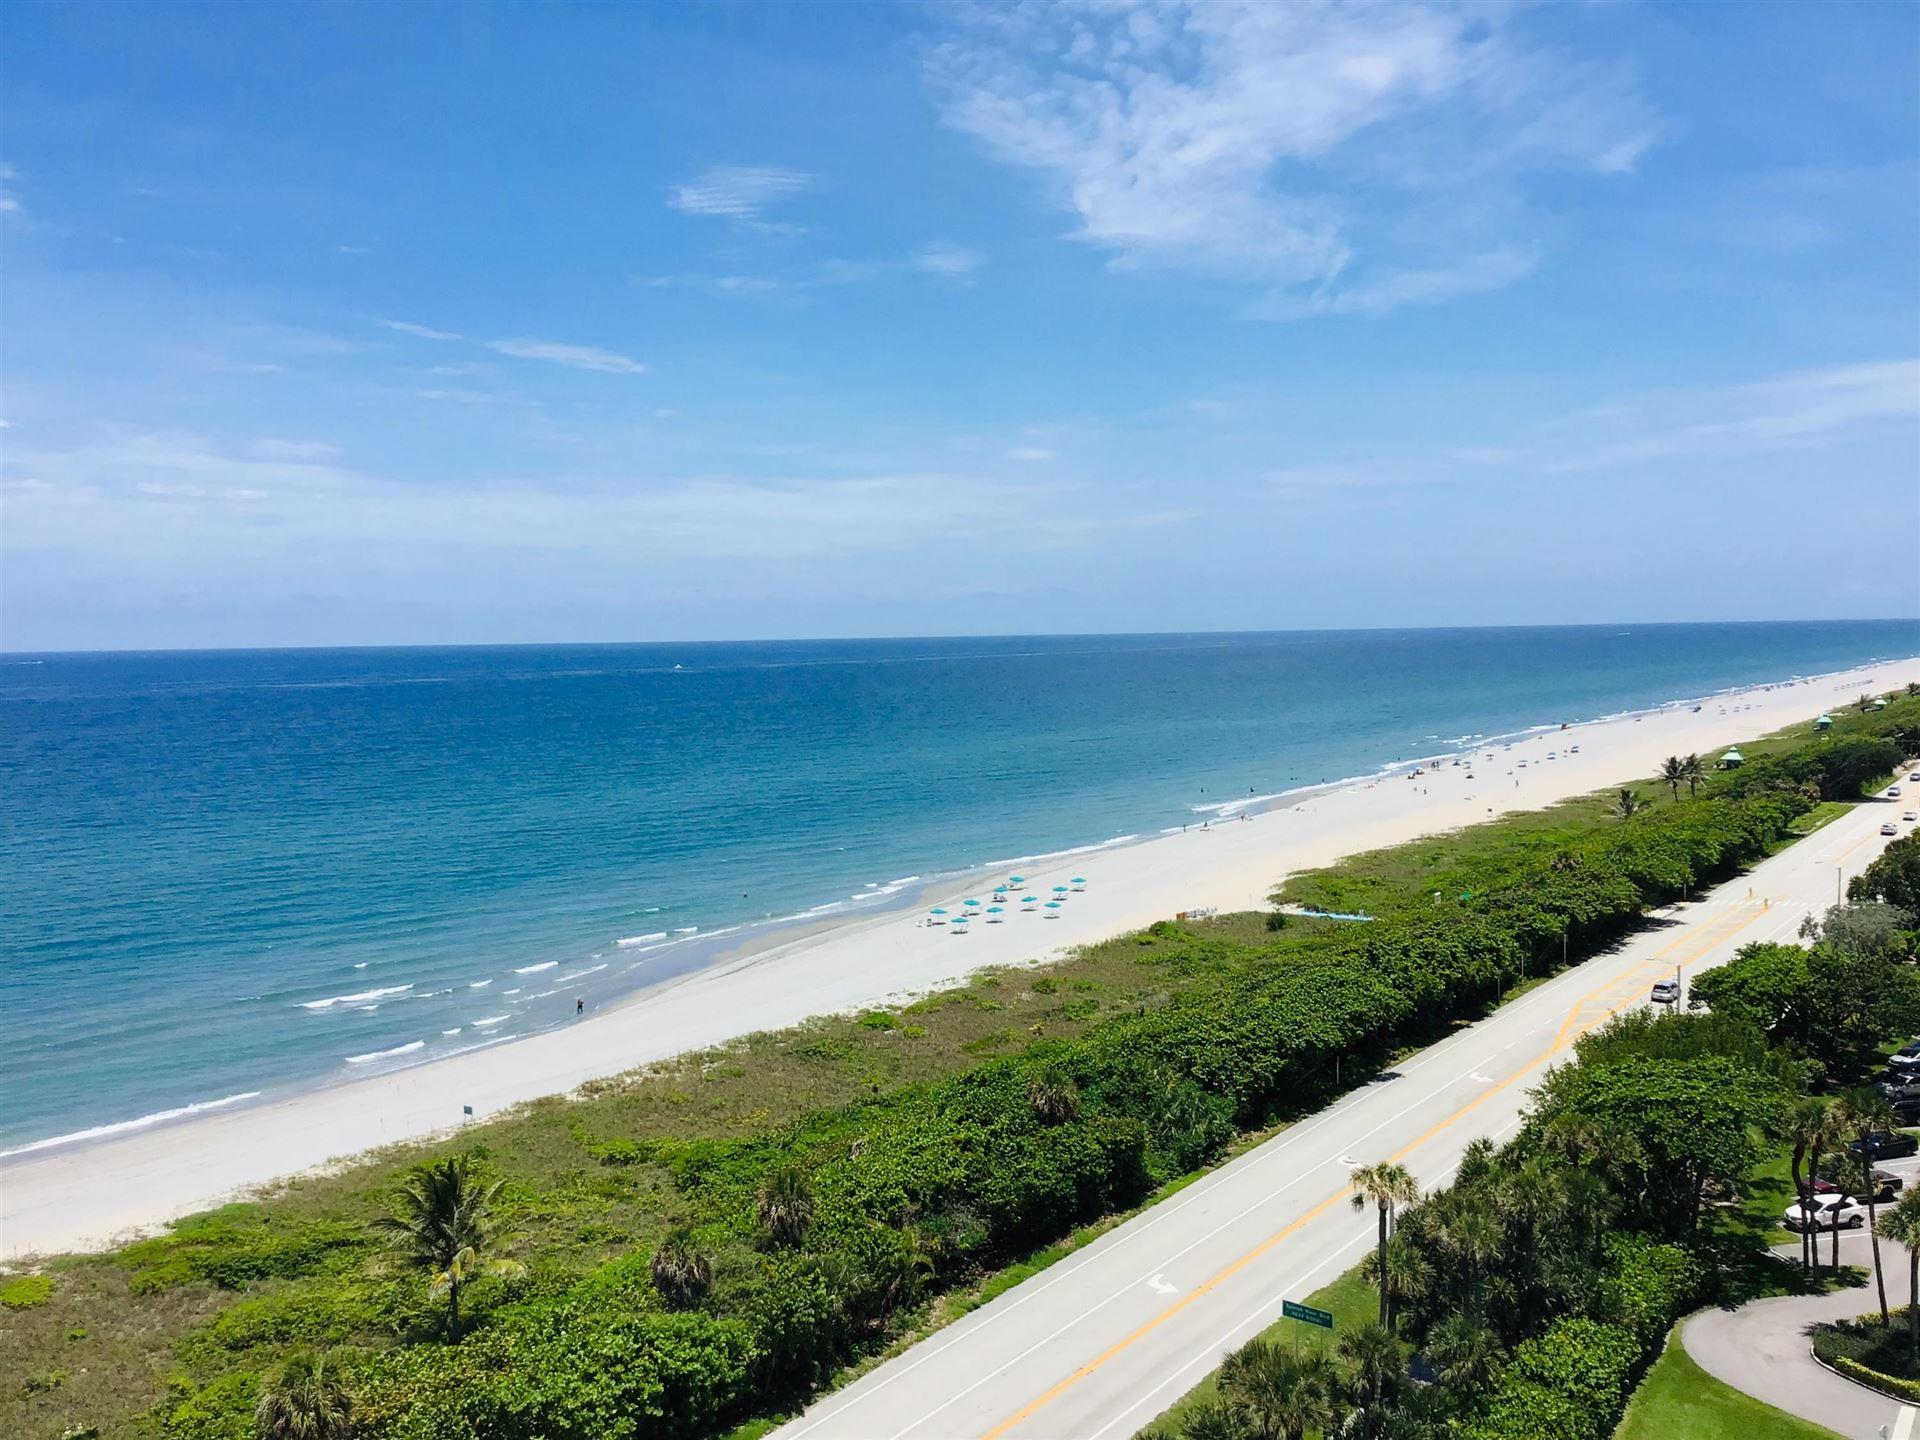 4545 N Ocean #15  B, Boca Raton, FL 33431 - #: RX-10631026